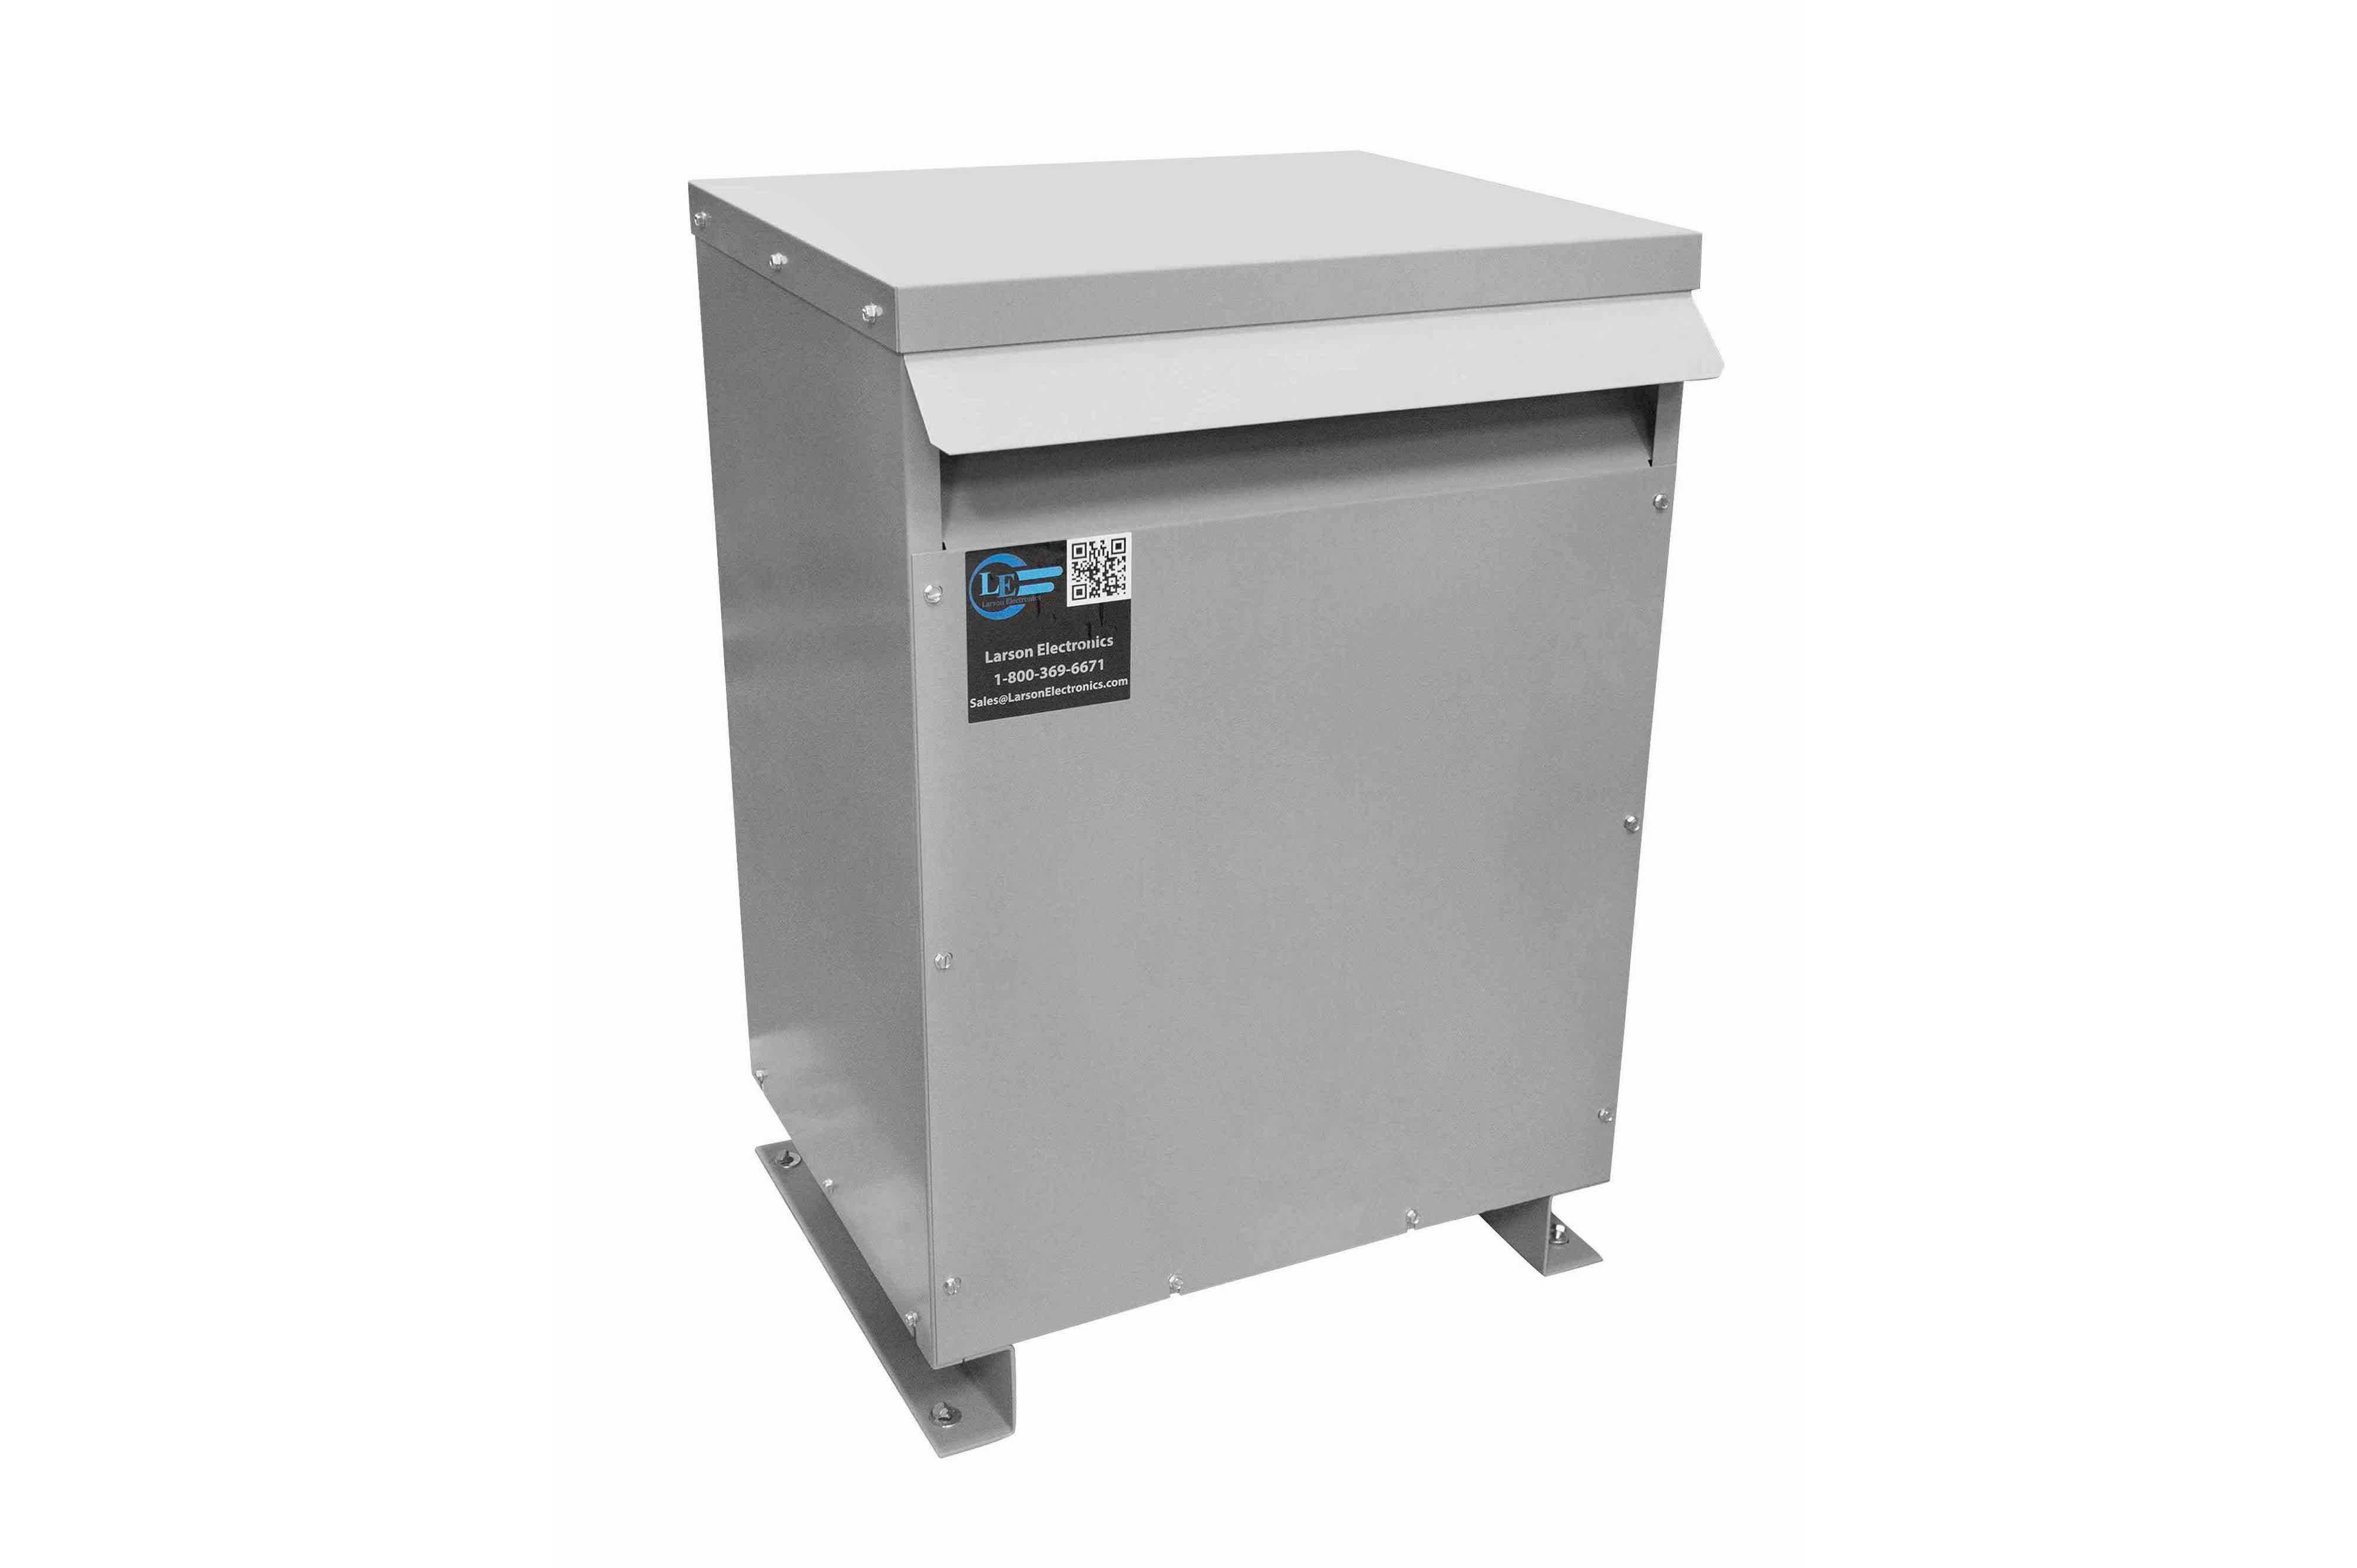 150 kVA 3PH DOE Transformer, 208V Delta Primary, 400Y/231 Wye-N Secondary, N3R, Ventilated, 60 Hz